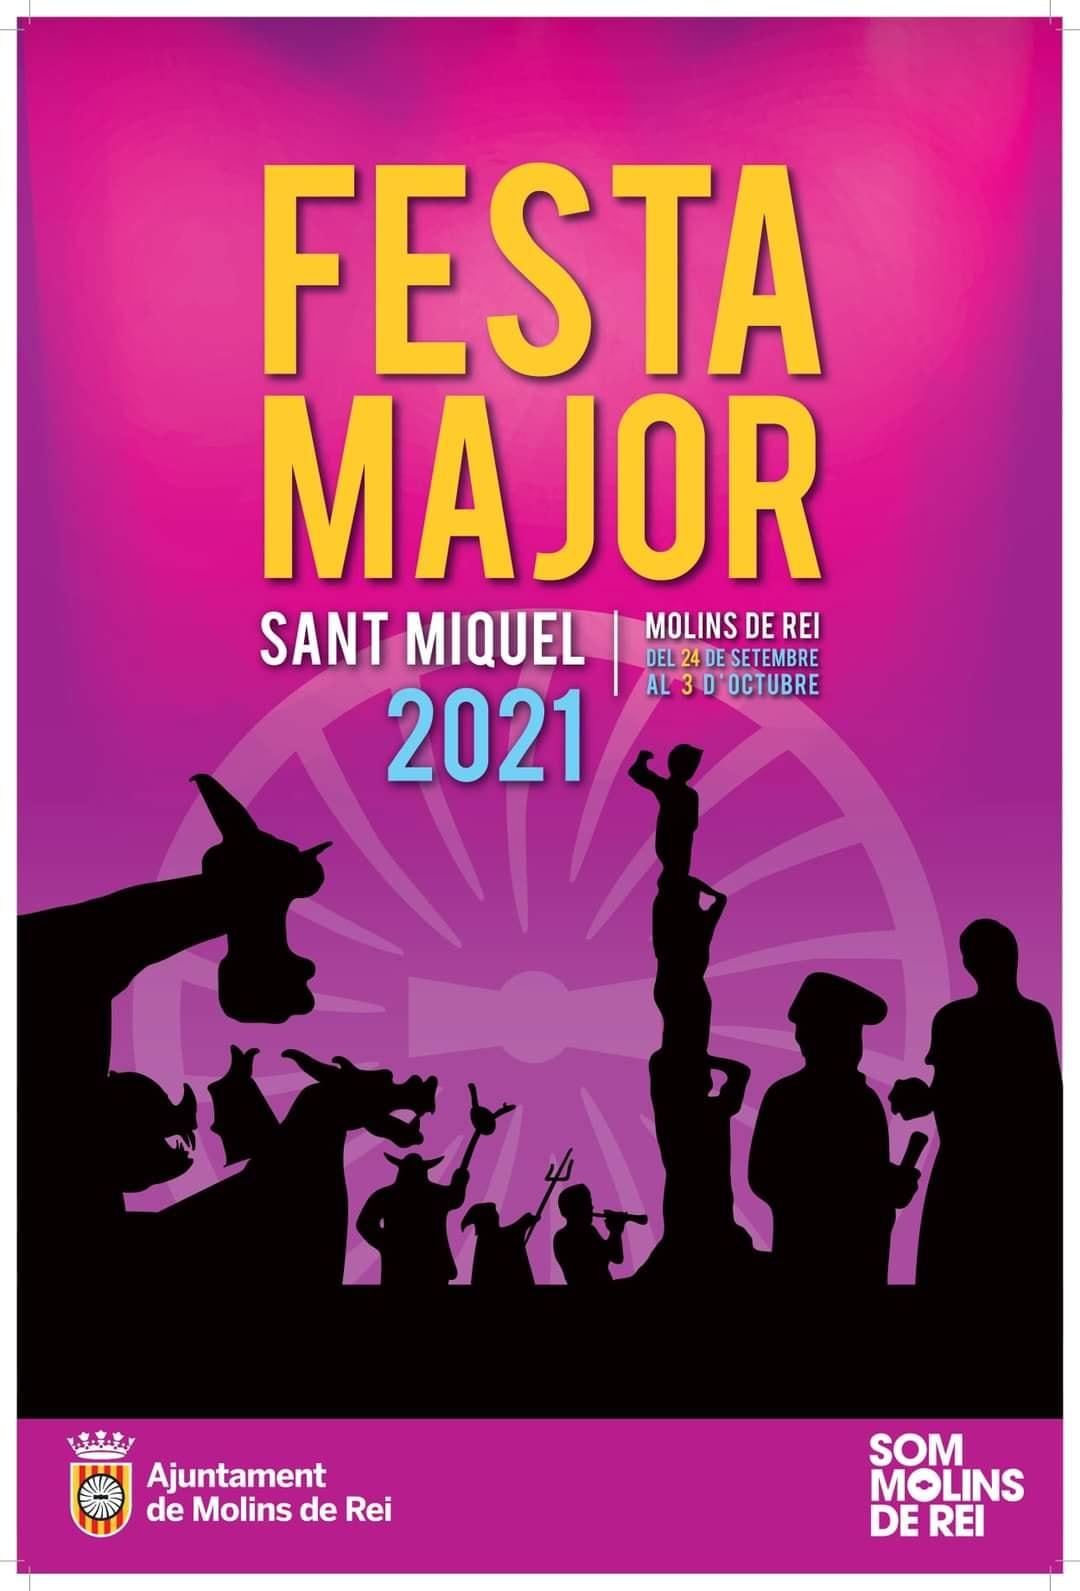 Cartell Festa Major Molins de Rei 2021